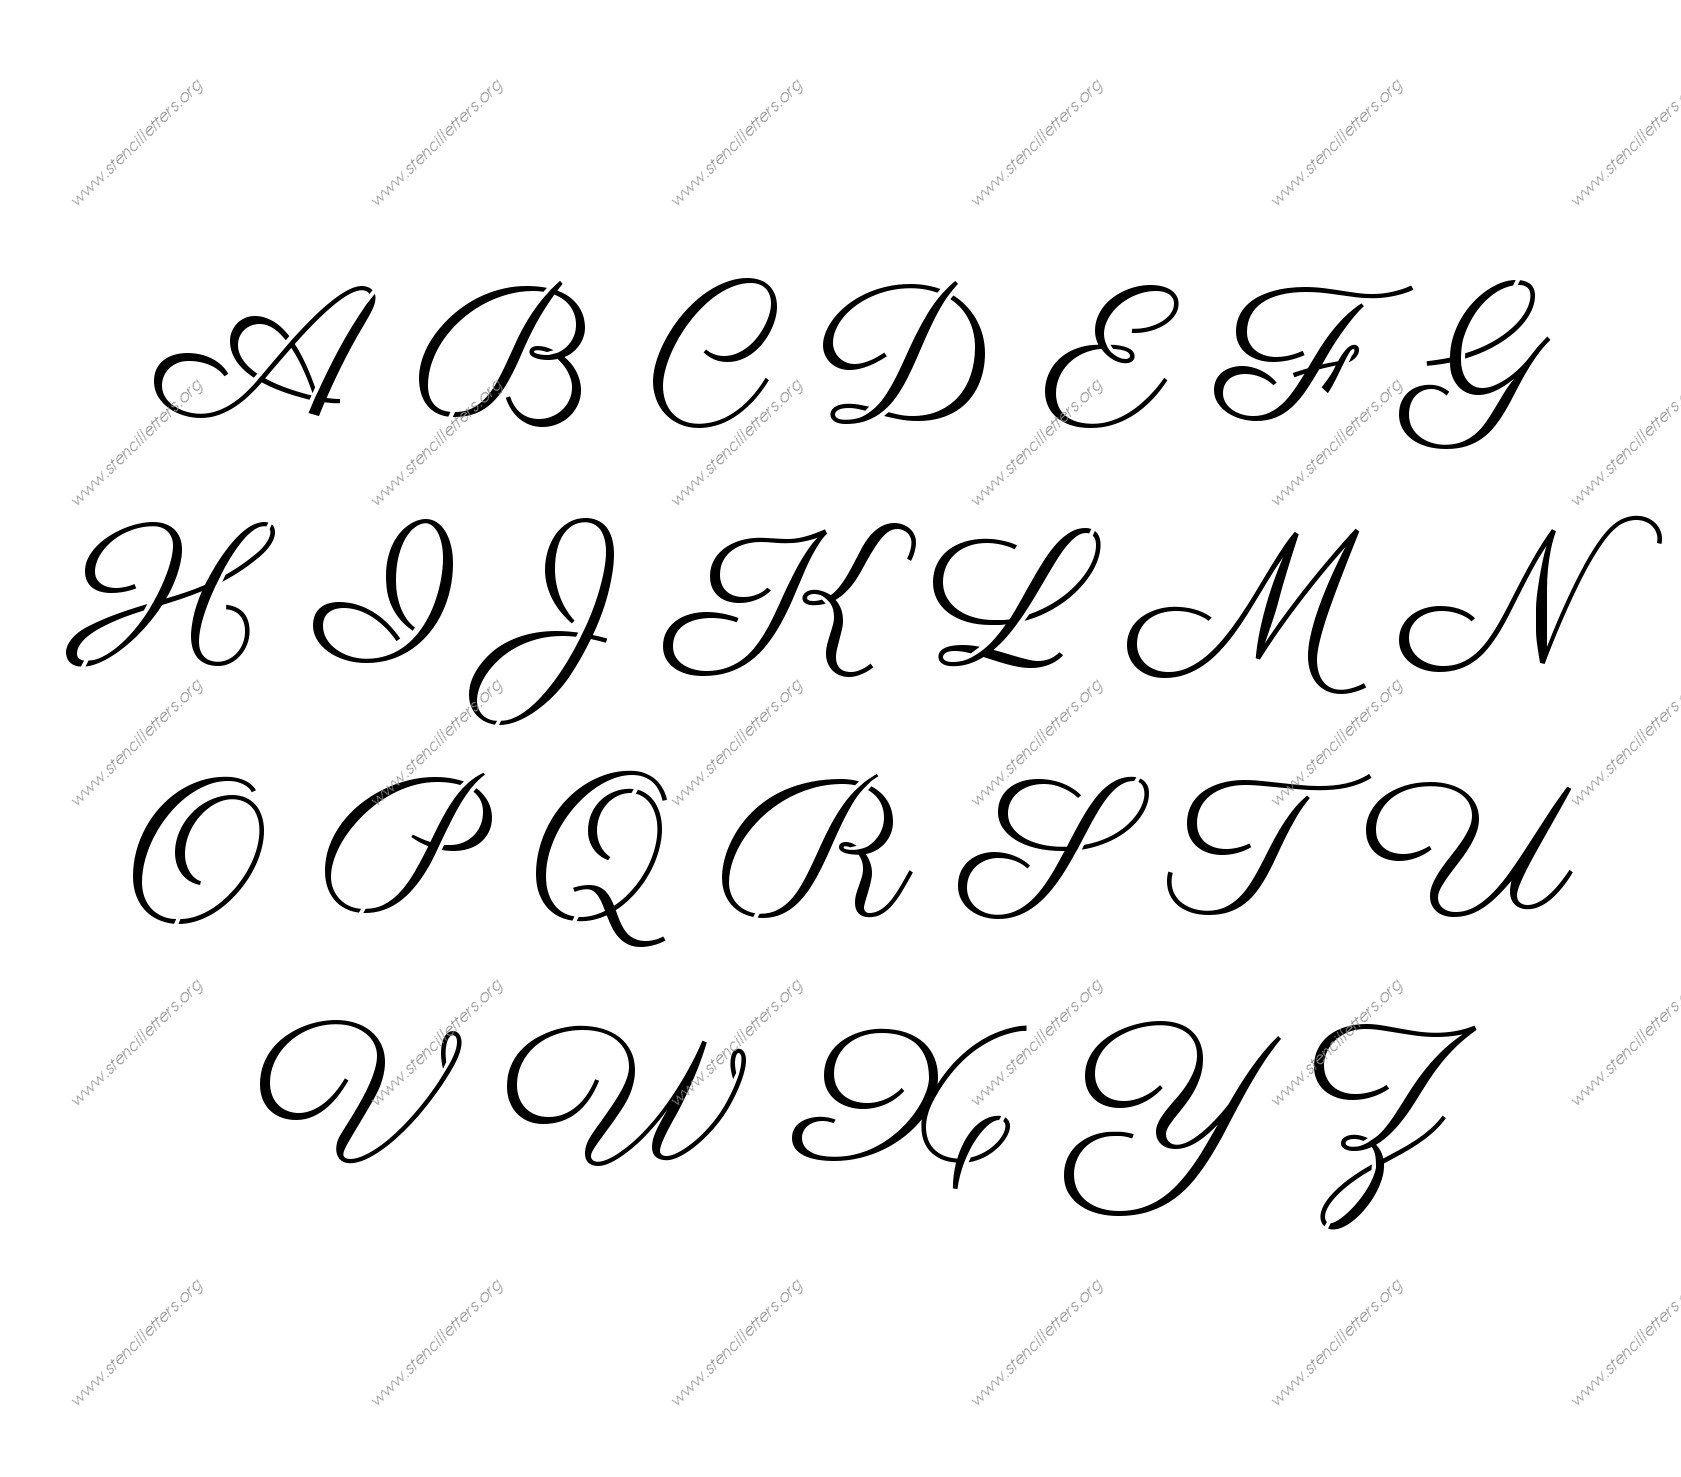 Free Printable Alphabet Stencil Letters Template | Art & Crafts - Free Printable Cut Out Letter Stencils